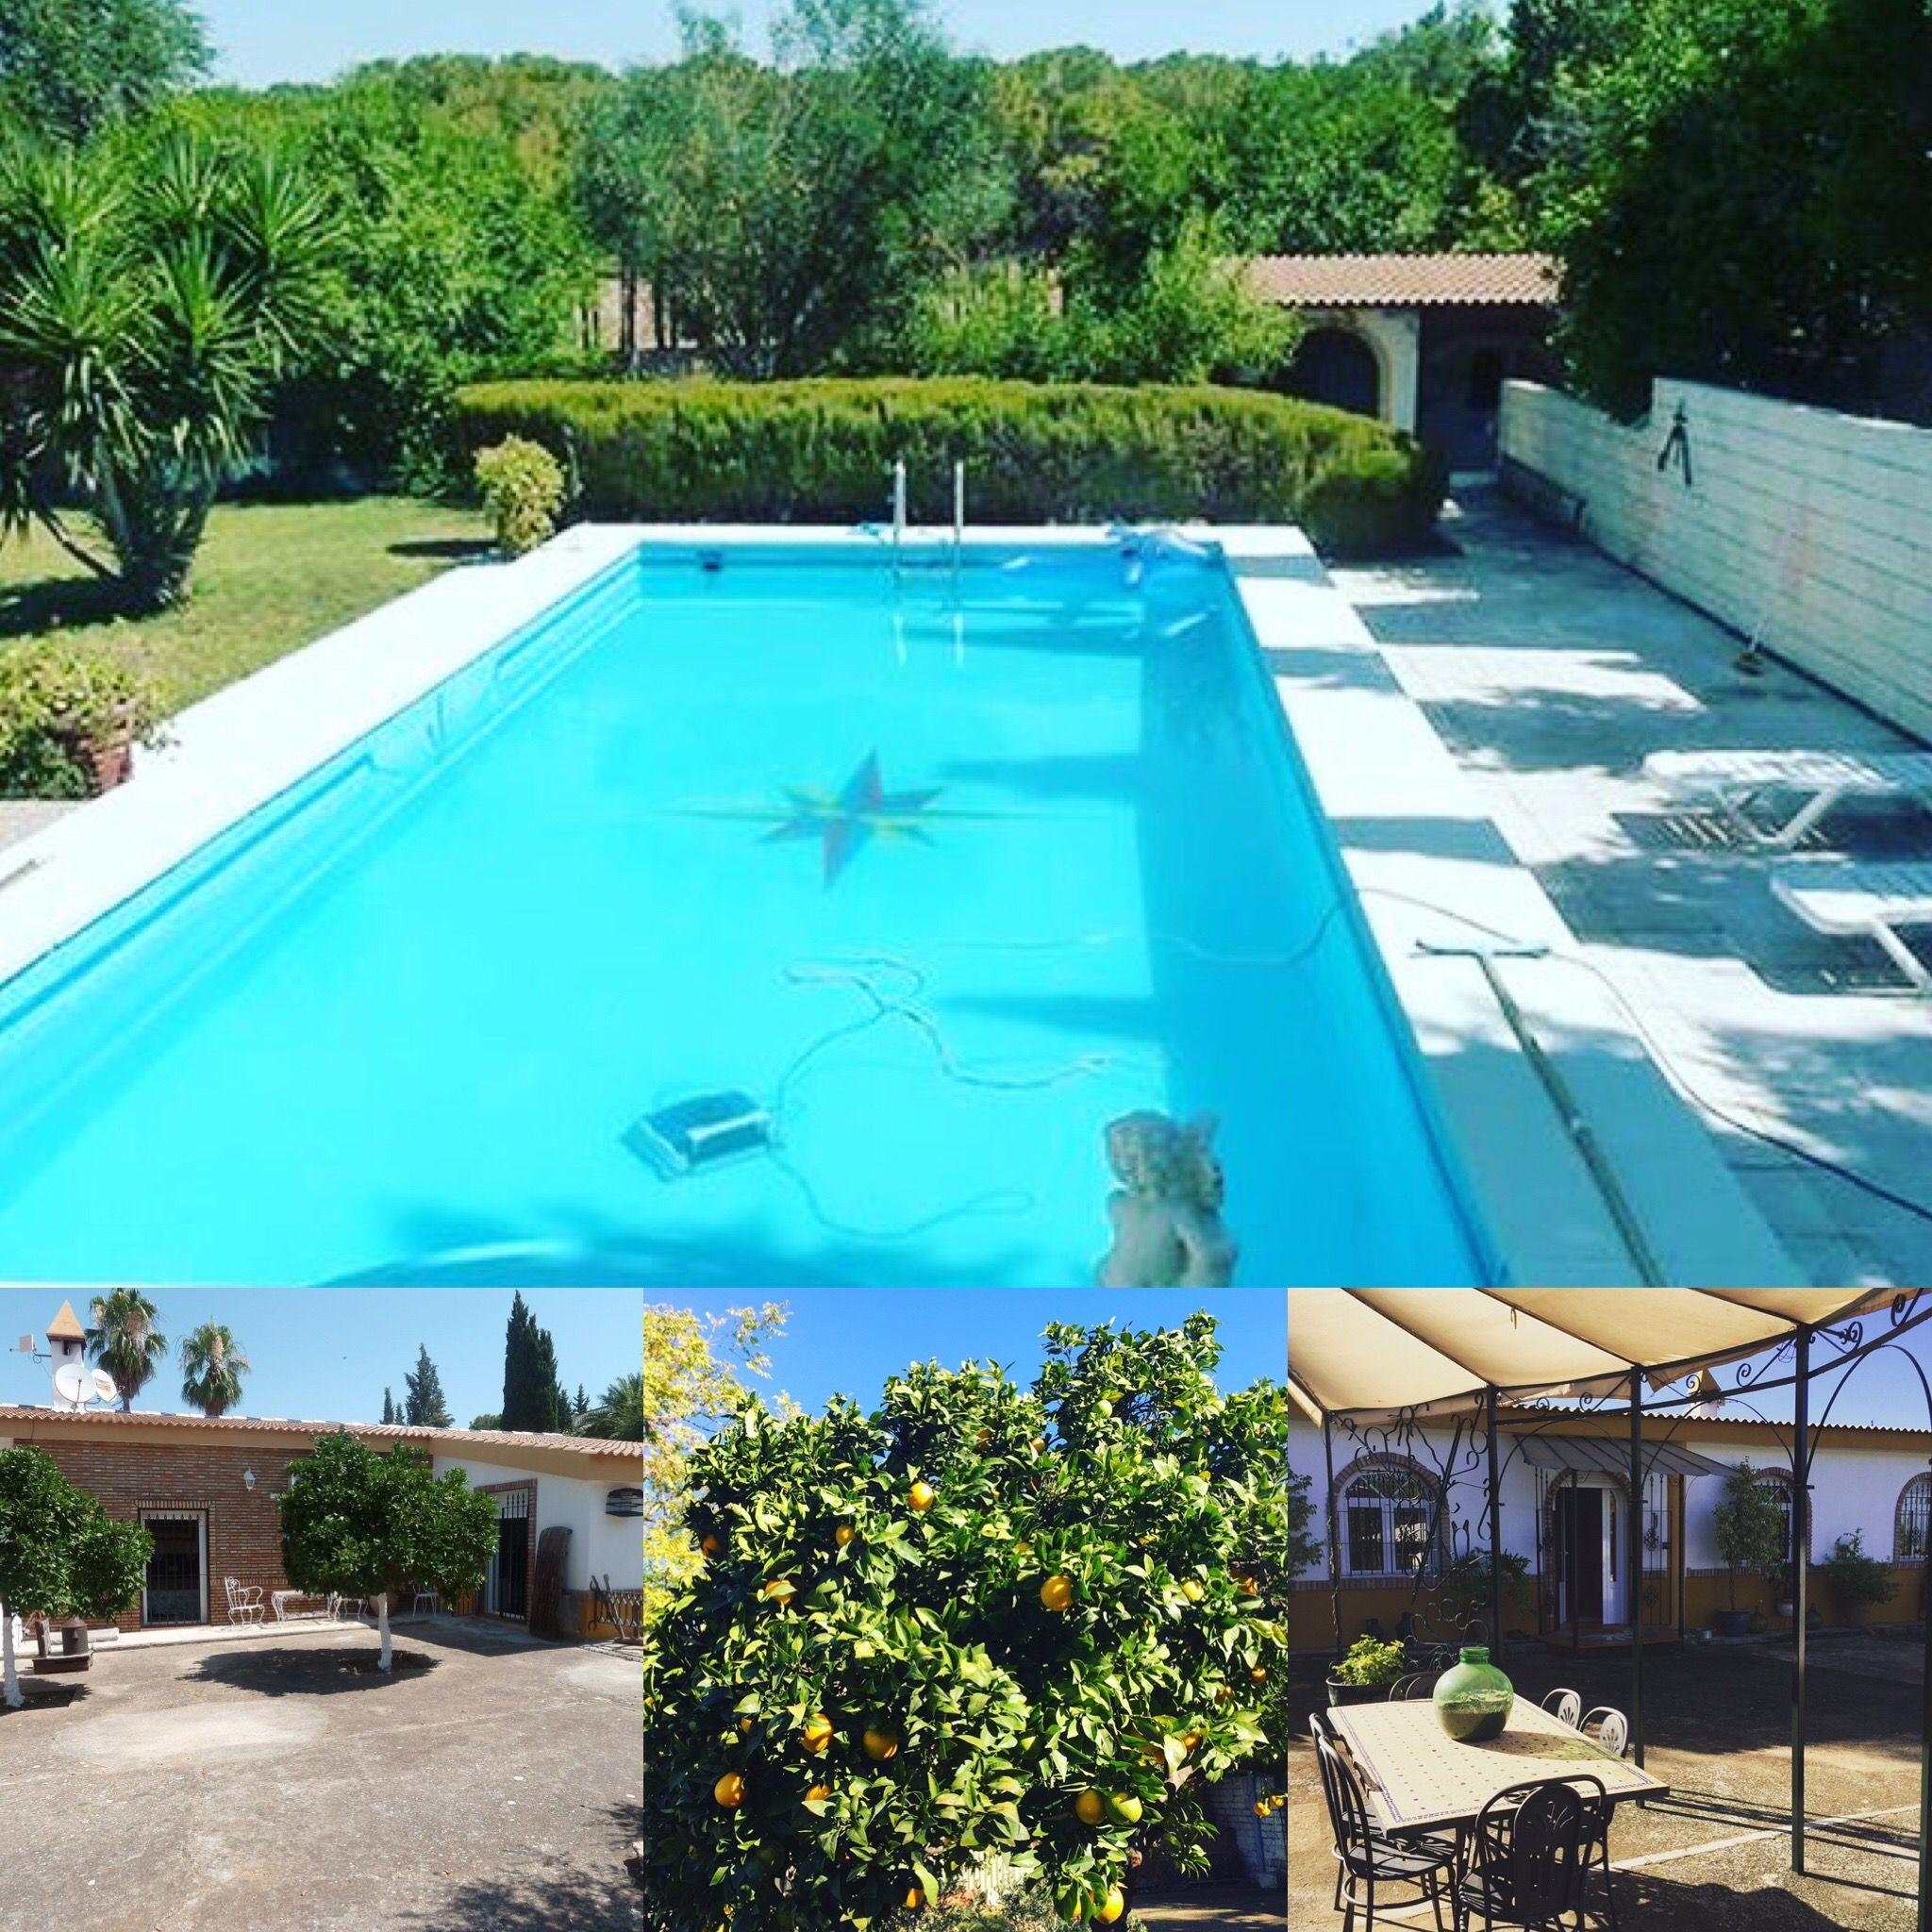 Venta mairena del alcor sevilla casa 3 dormitorios boxes para caballos piscina a - Piscinas en el campo ...